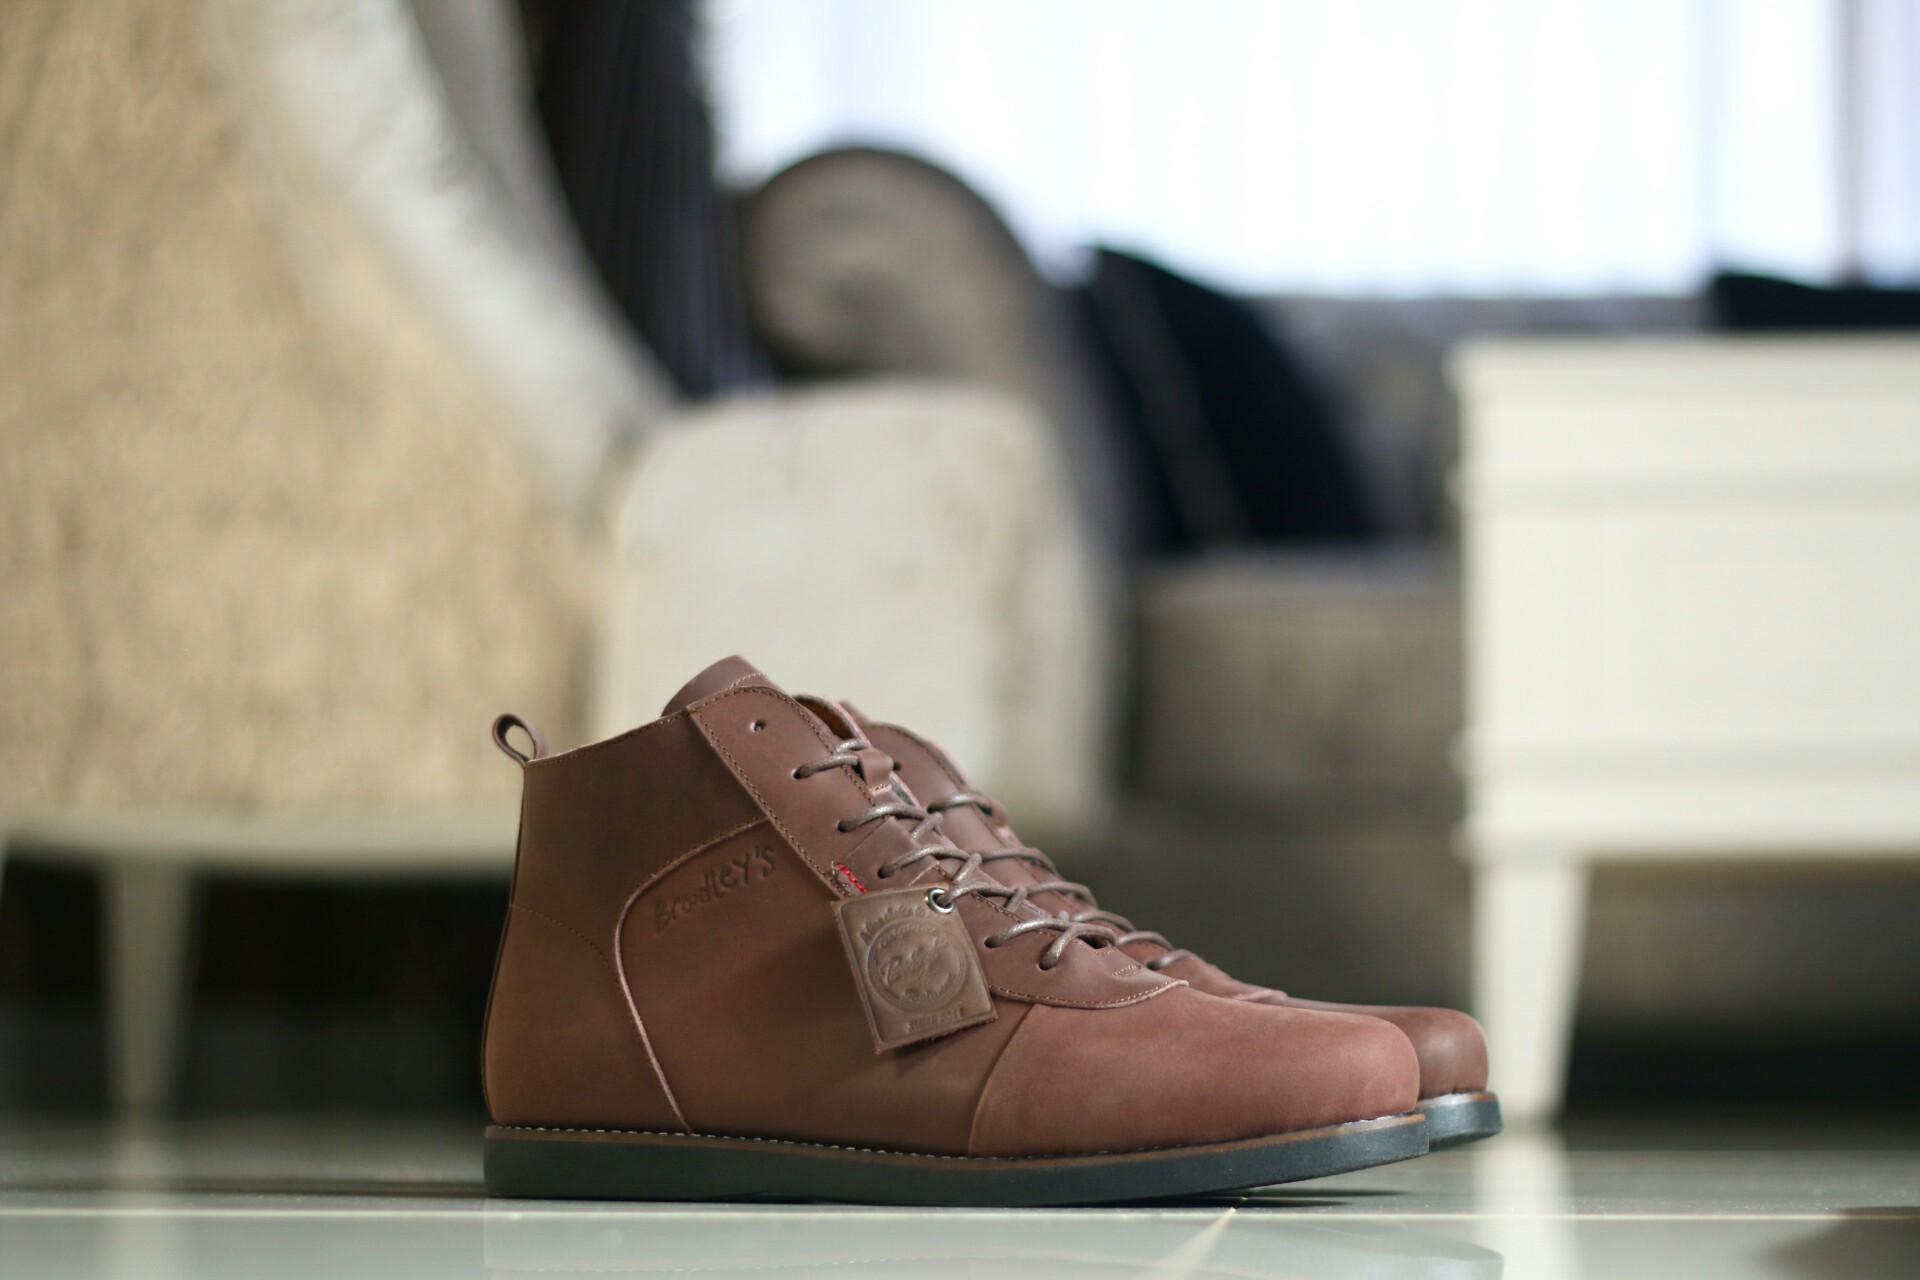 Sepatu Bradley Zapato Chopper Kulit Asli Boot Erol Pria Boots Bradleys Anubis